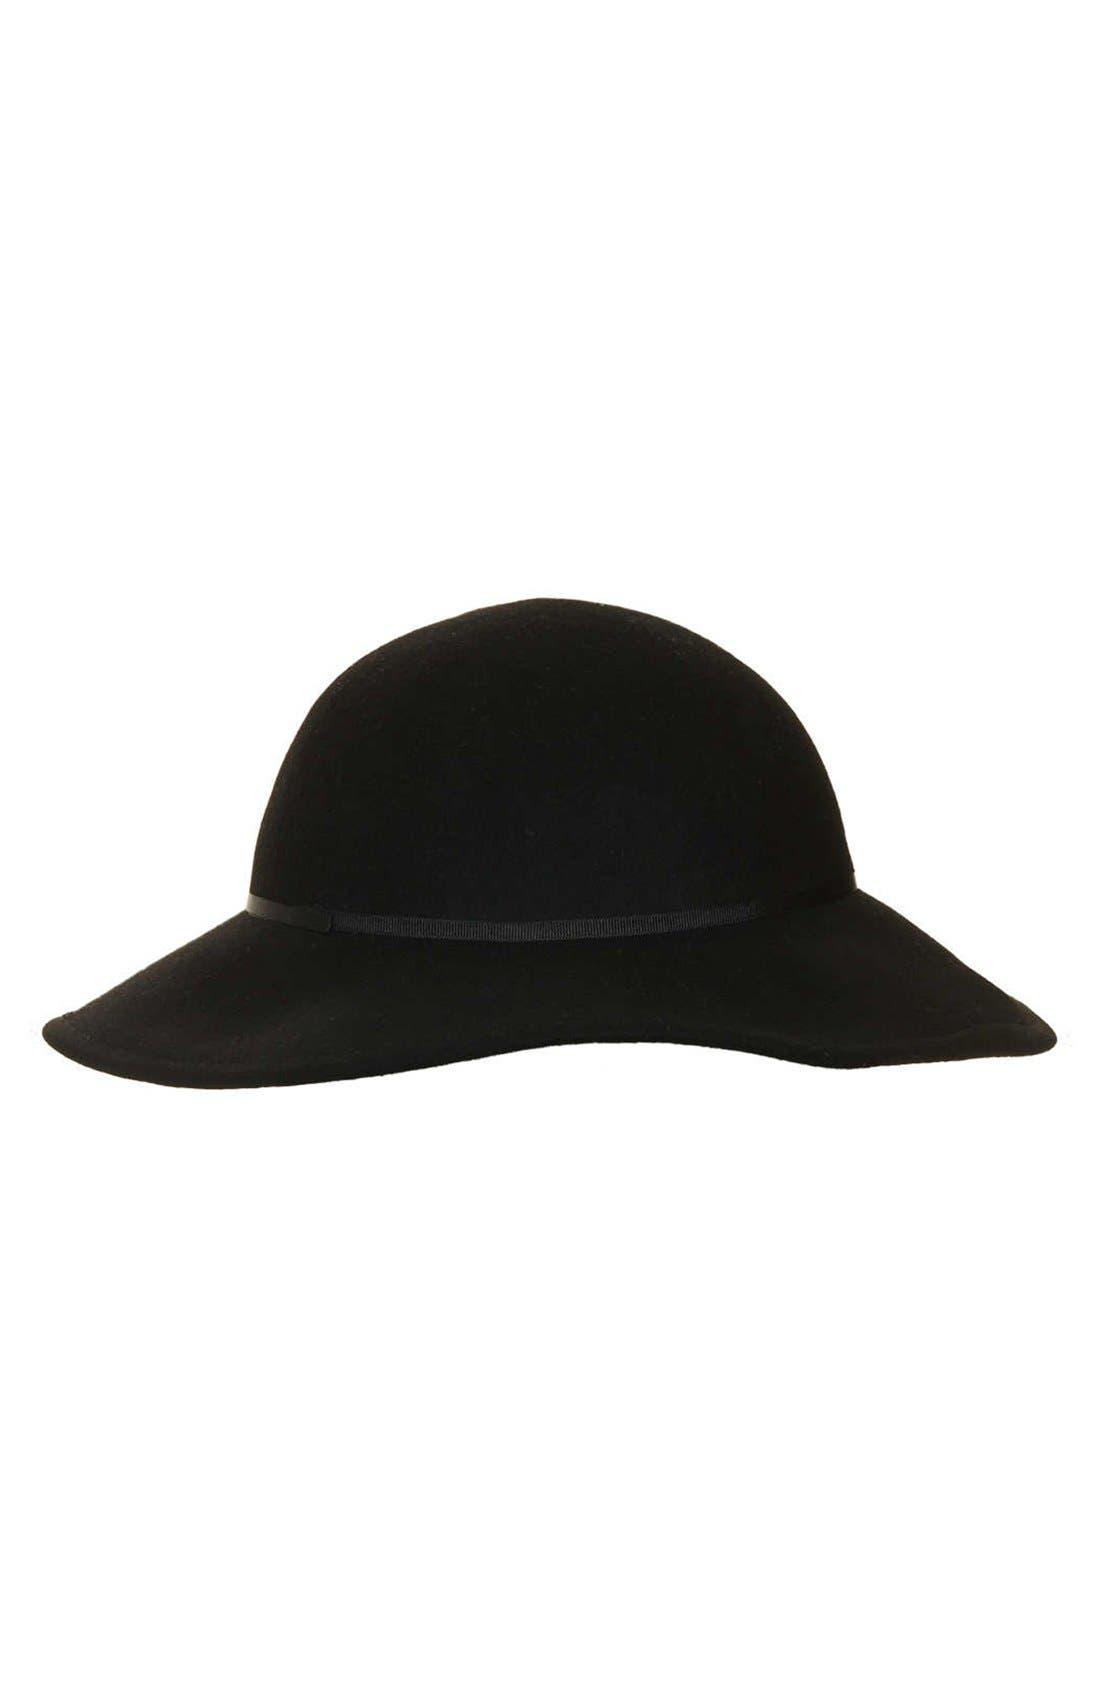 Main Image - Topshop 'Beekeeper' Felt Hat